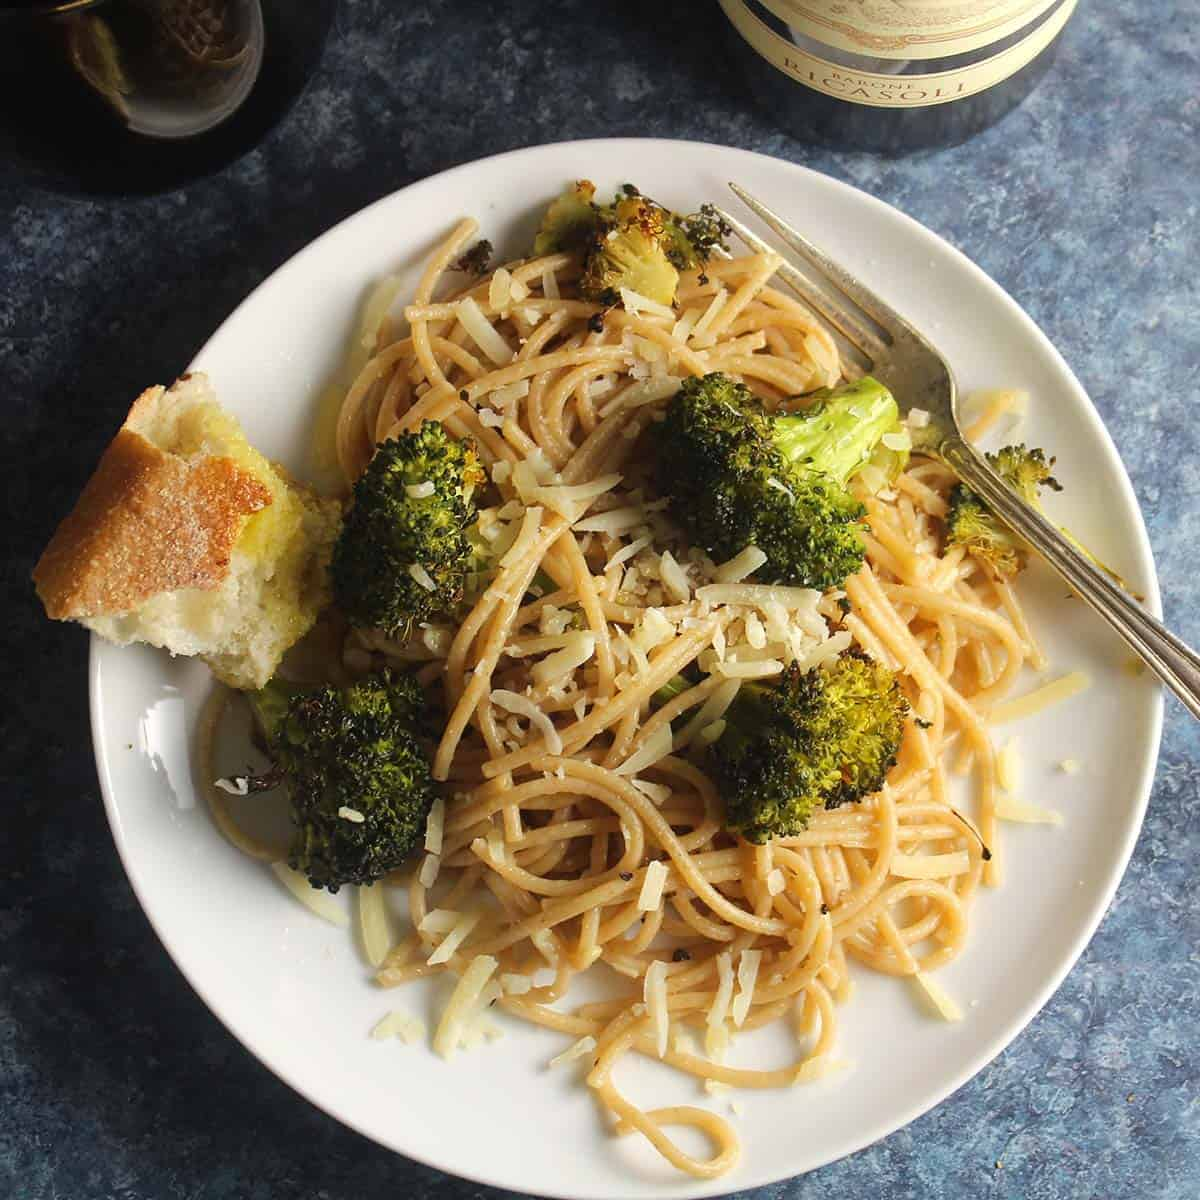 garlic broccoli pasta plated.